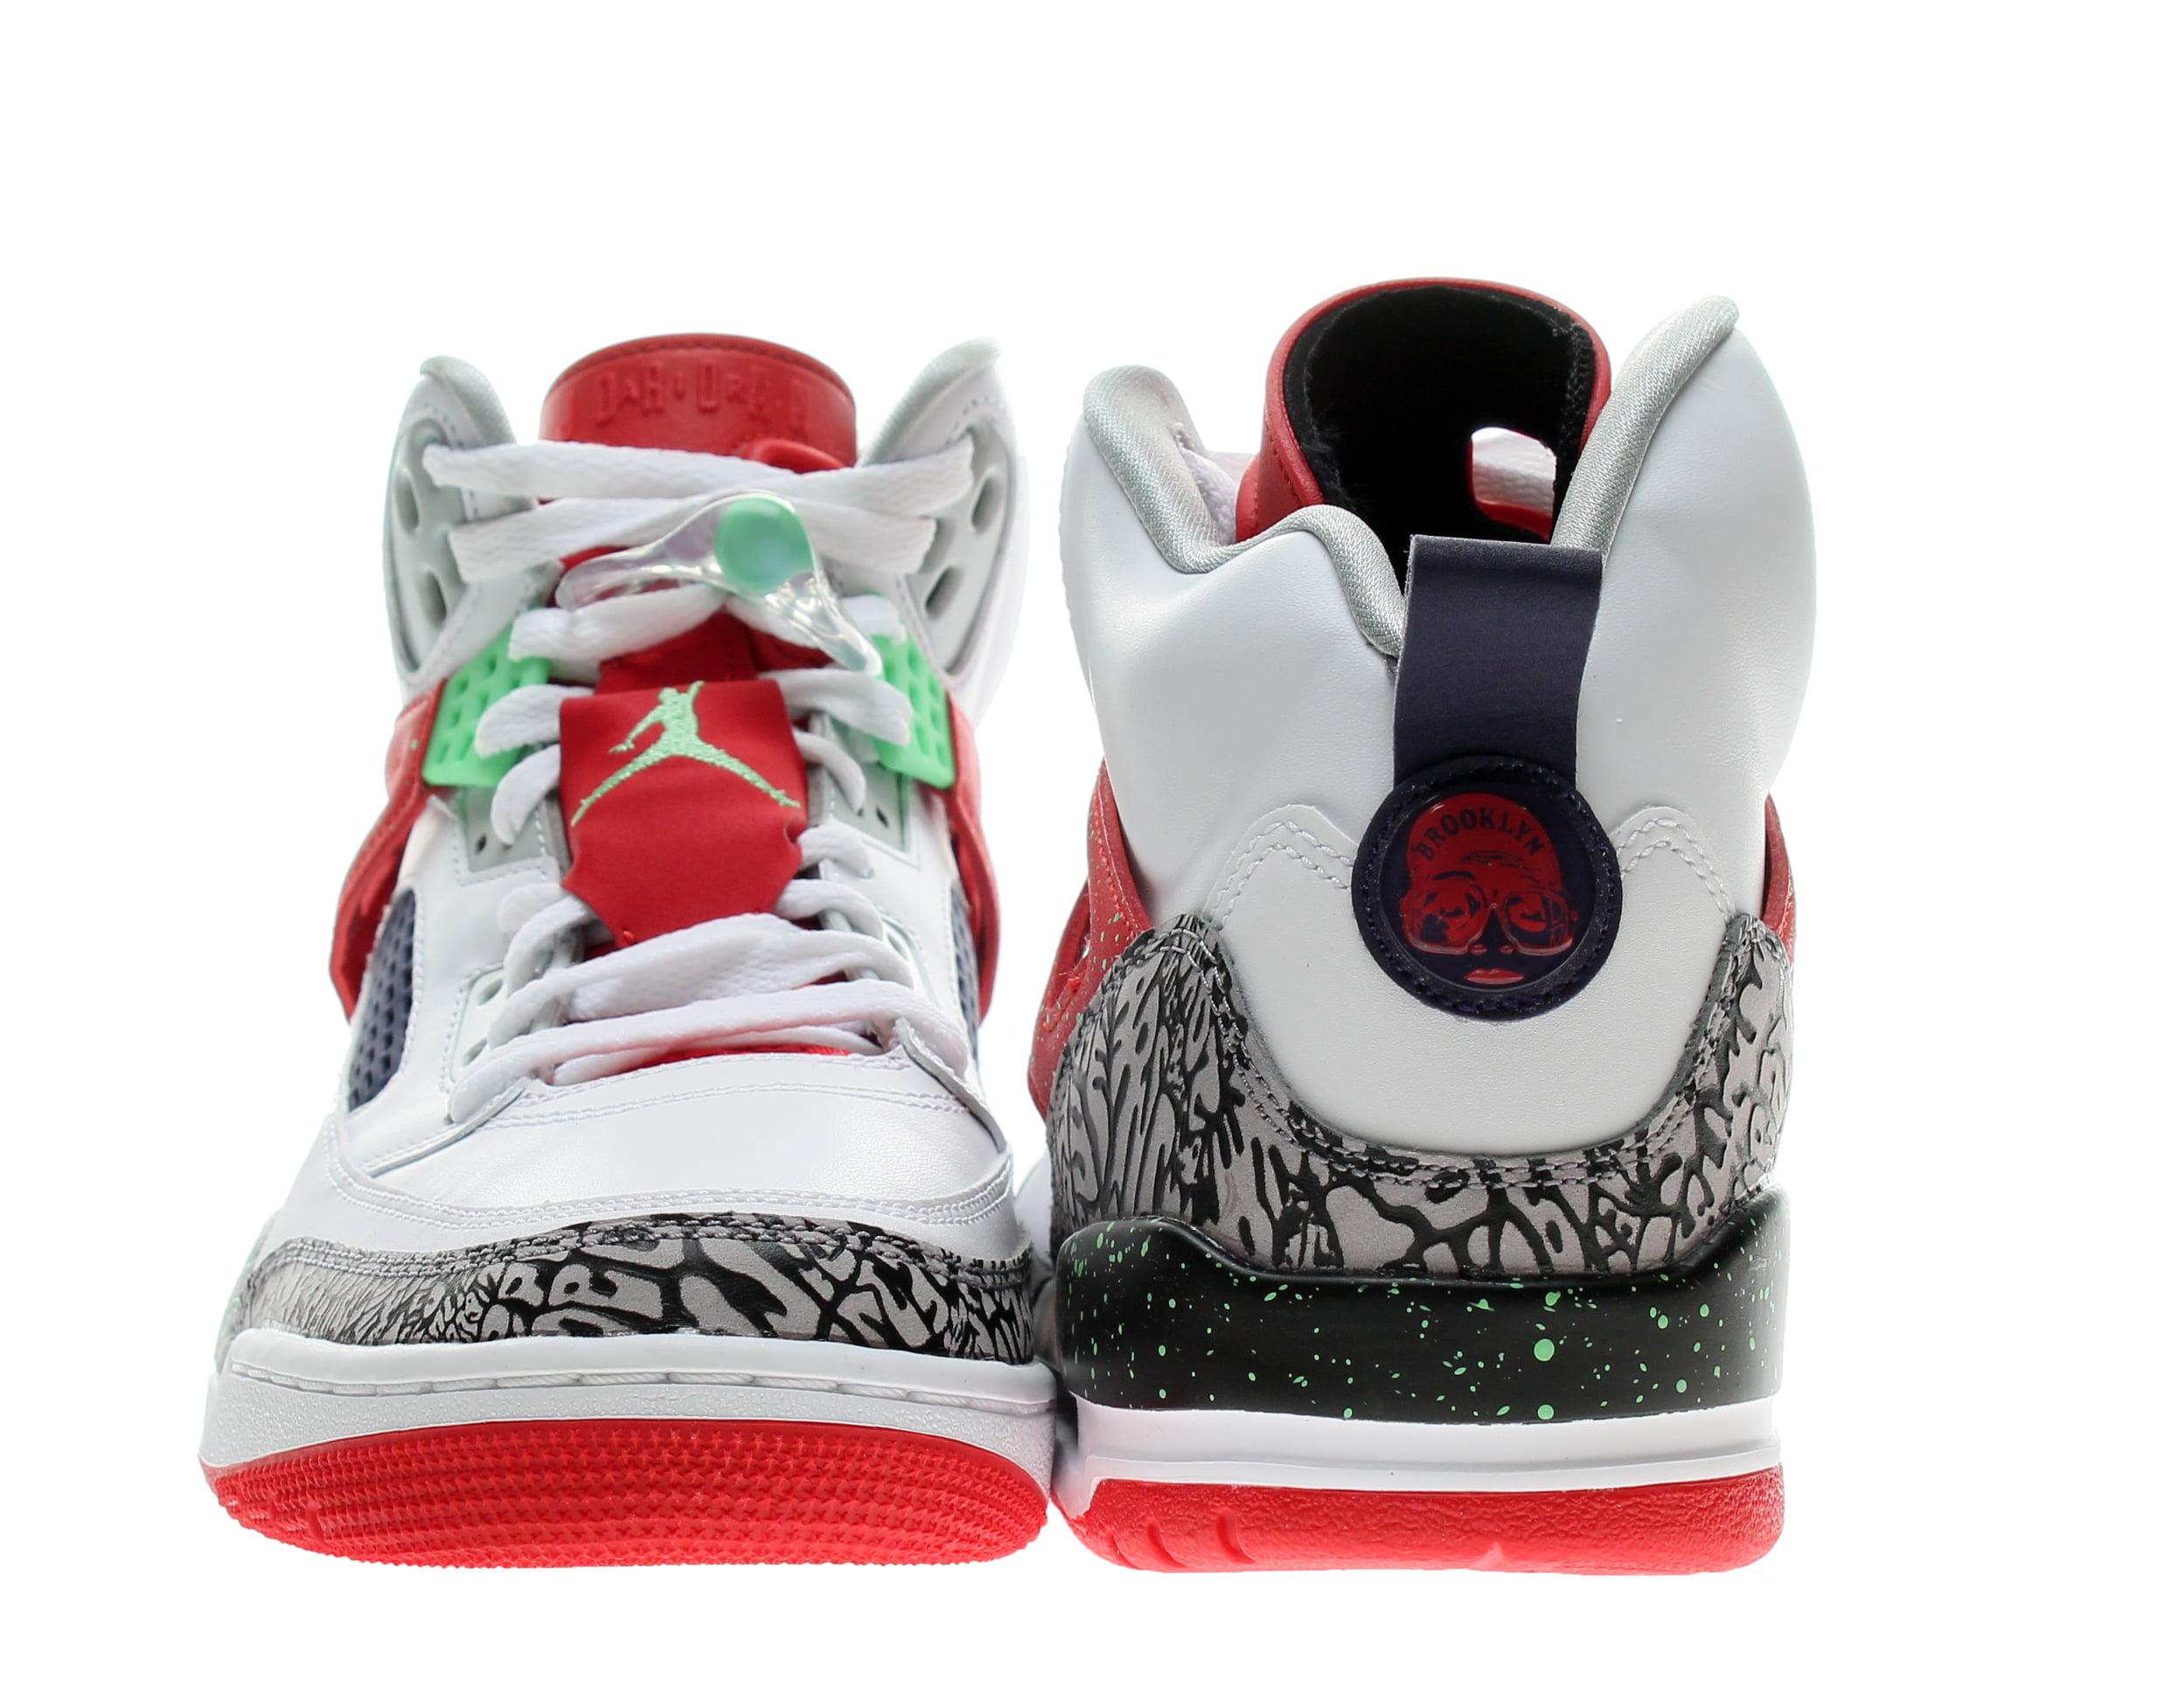 info for 77e5d 8947c Jordan - Nike Air Jordan Spizike White University Red Men s Basketball  Shoes 315371-132 - Walmart.com